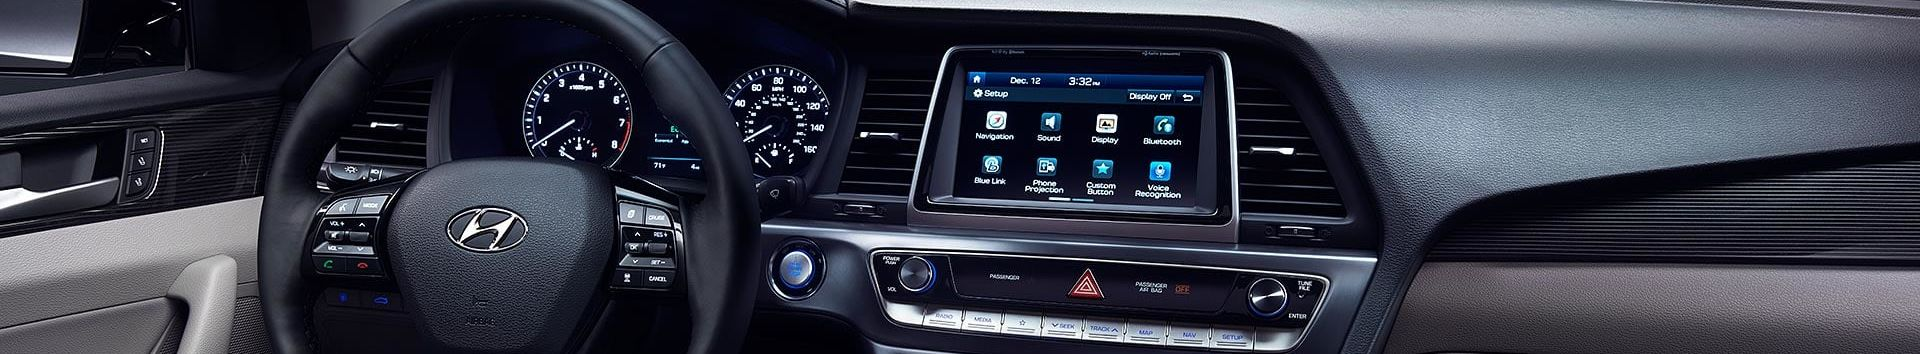 2018 Hyundai Sonata Center Console